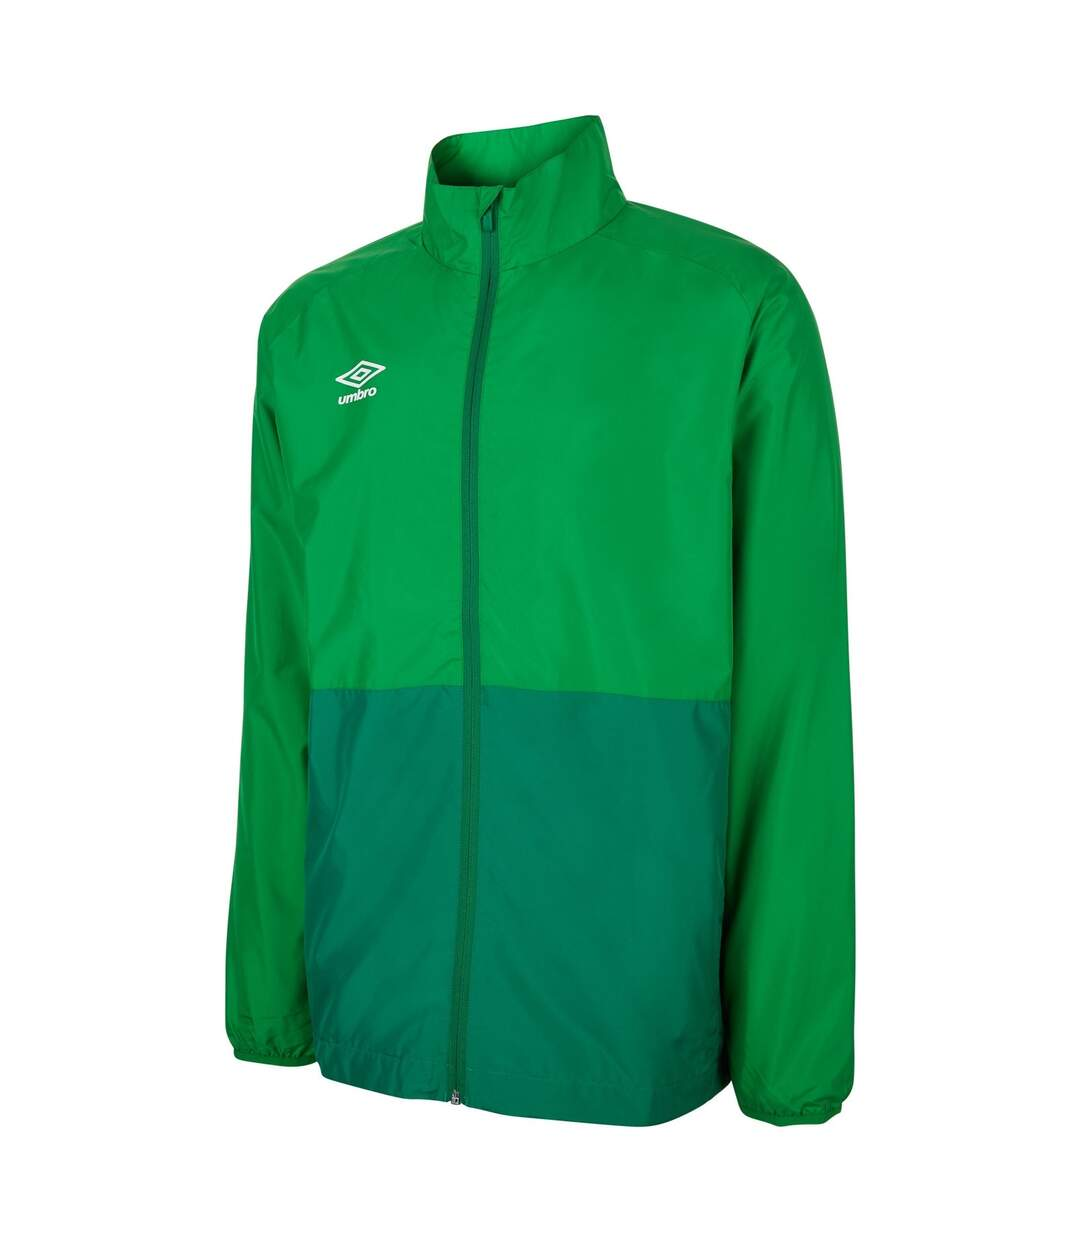 Umbro Mens Showerproof Training Jacket (Emerald Green/Verdant Green) - UTGD109